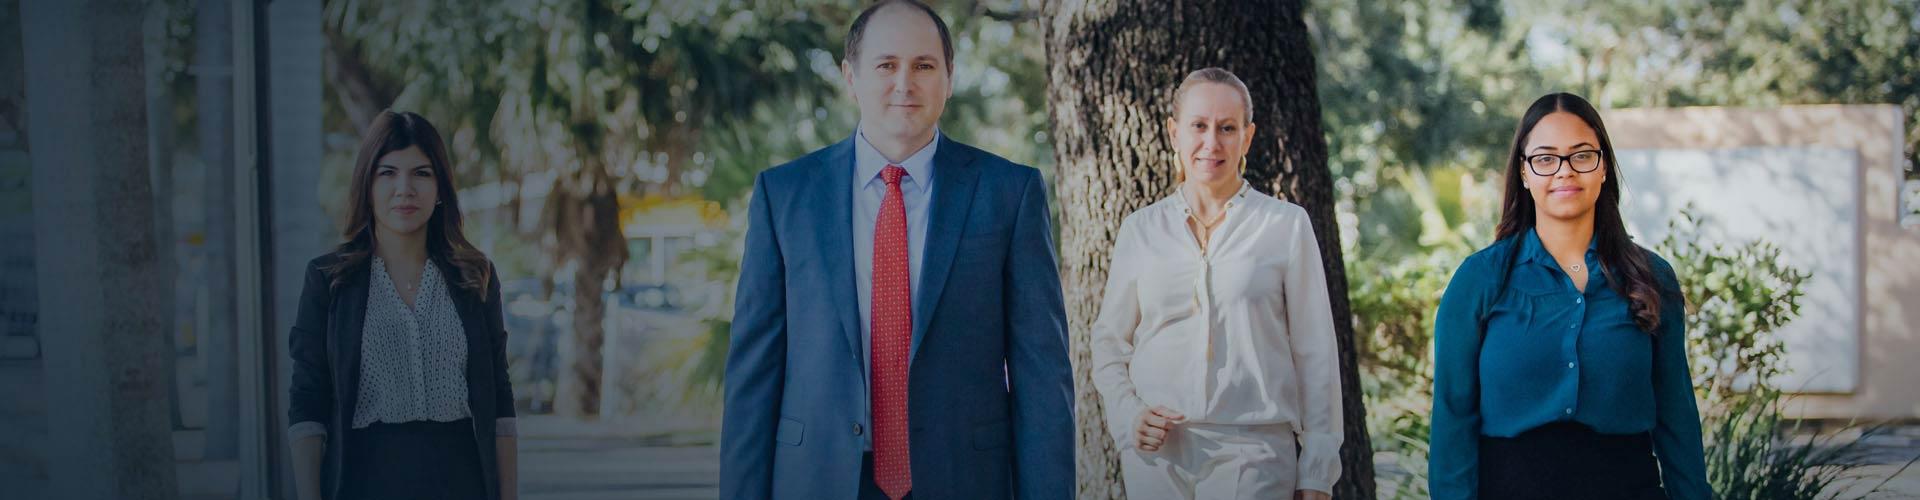 Florida Bankruptcy Lawyers Near Me - Stiberman Law Firm